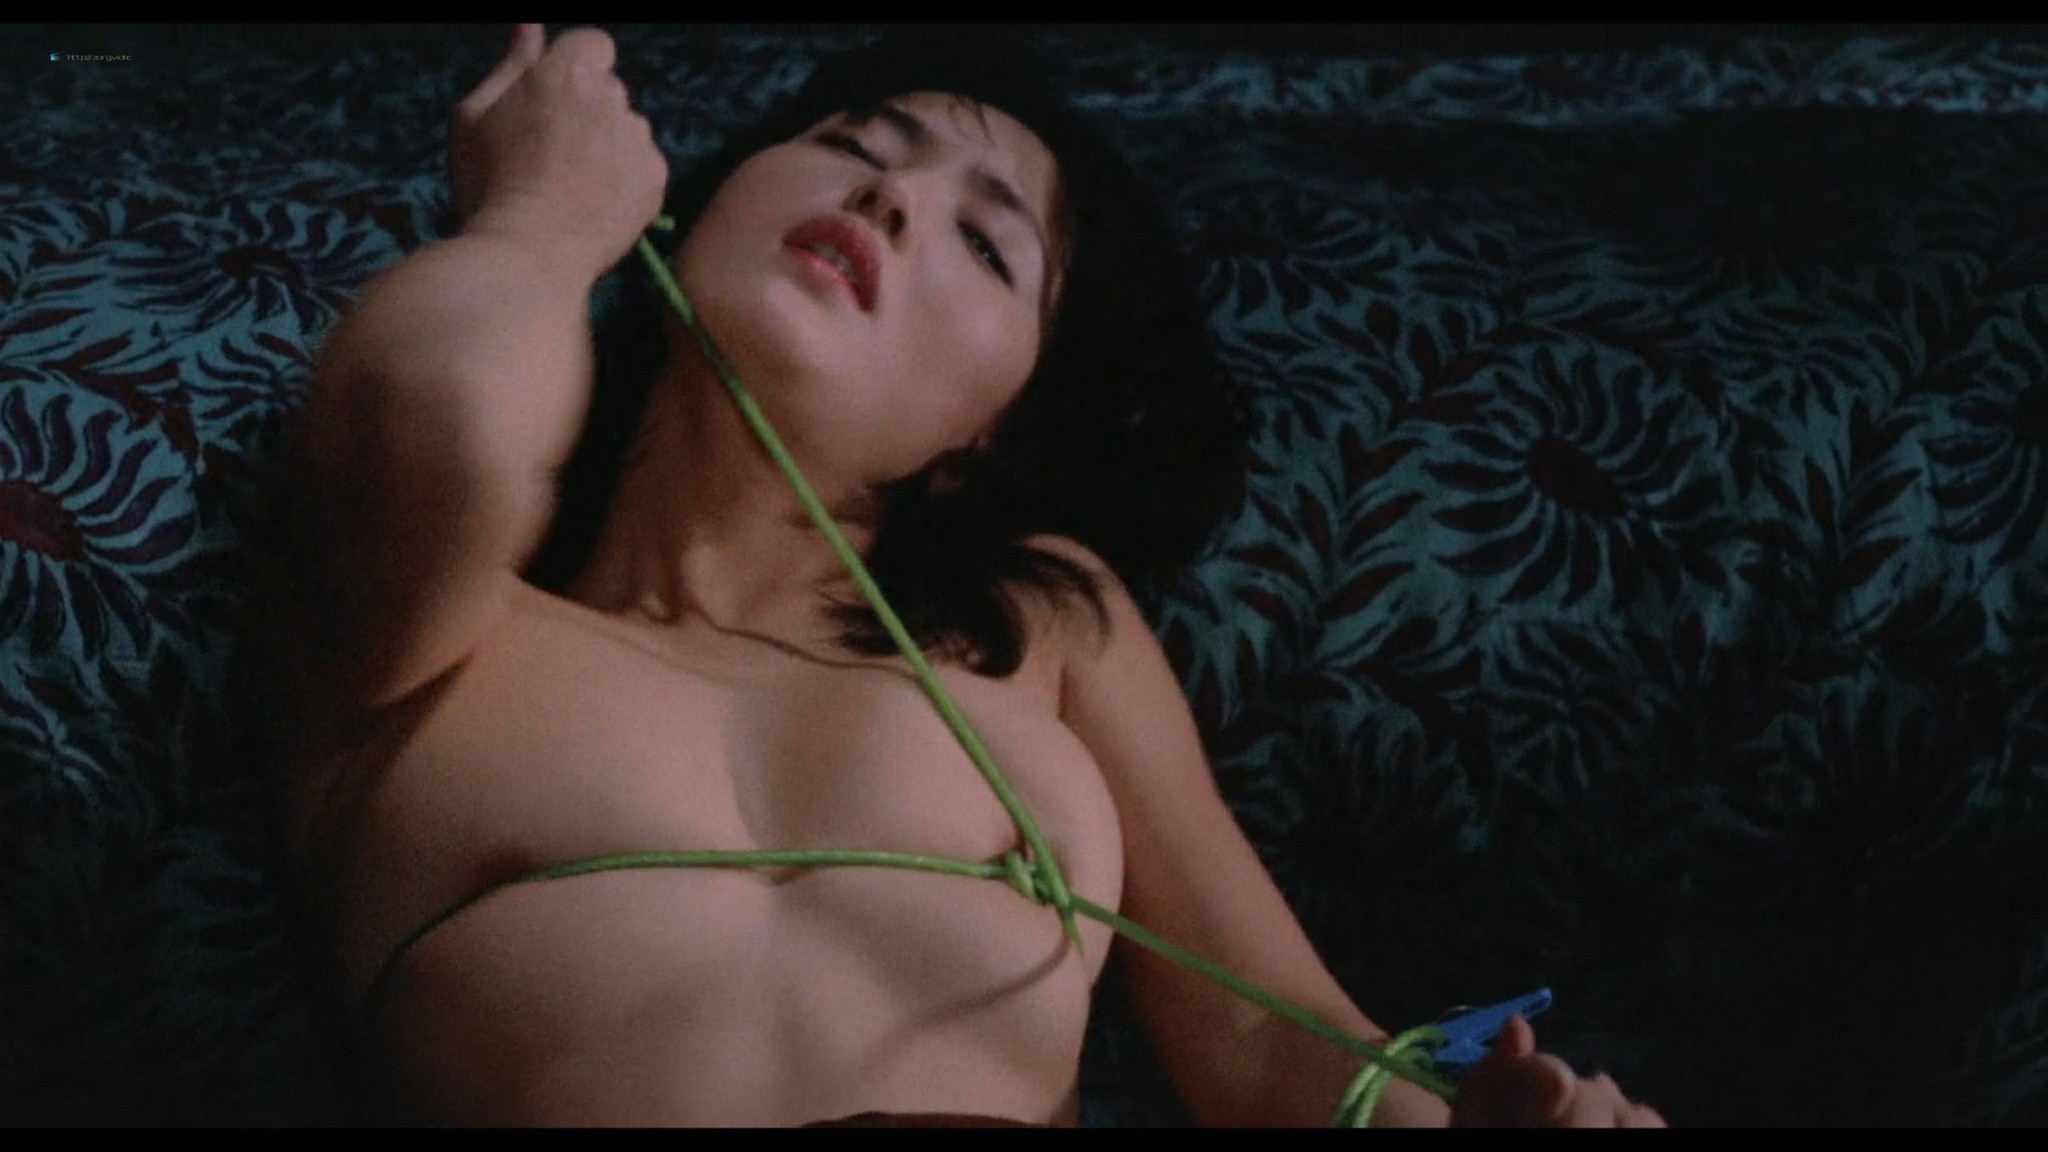 Jun Izumi nude hot sex - Angel Guts: Red Porno (JP-1981) HD 1080p BluRay (5)